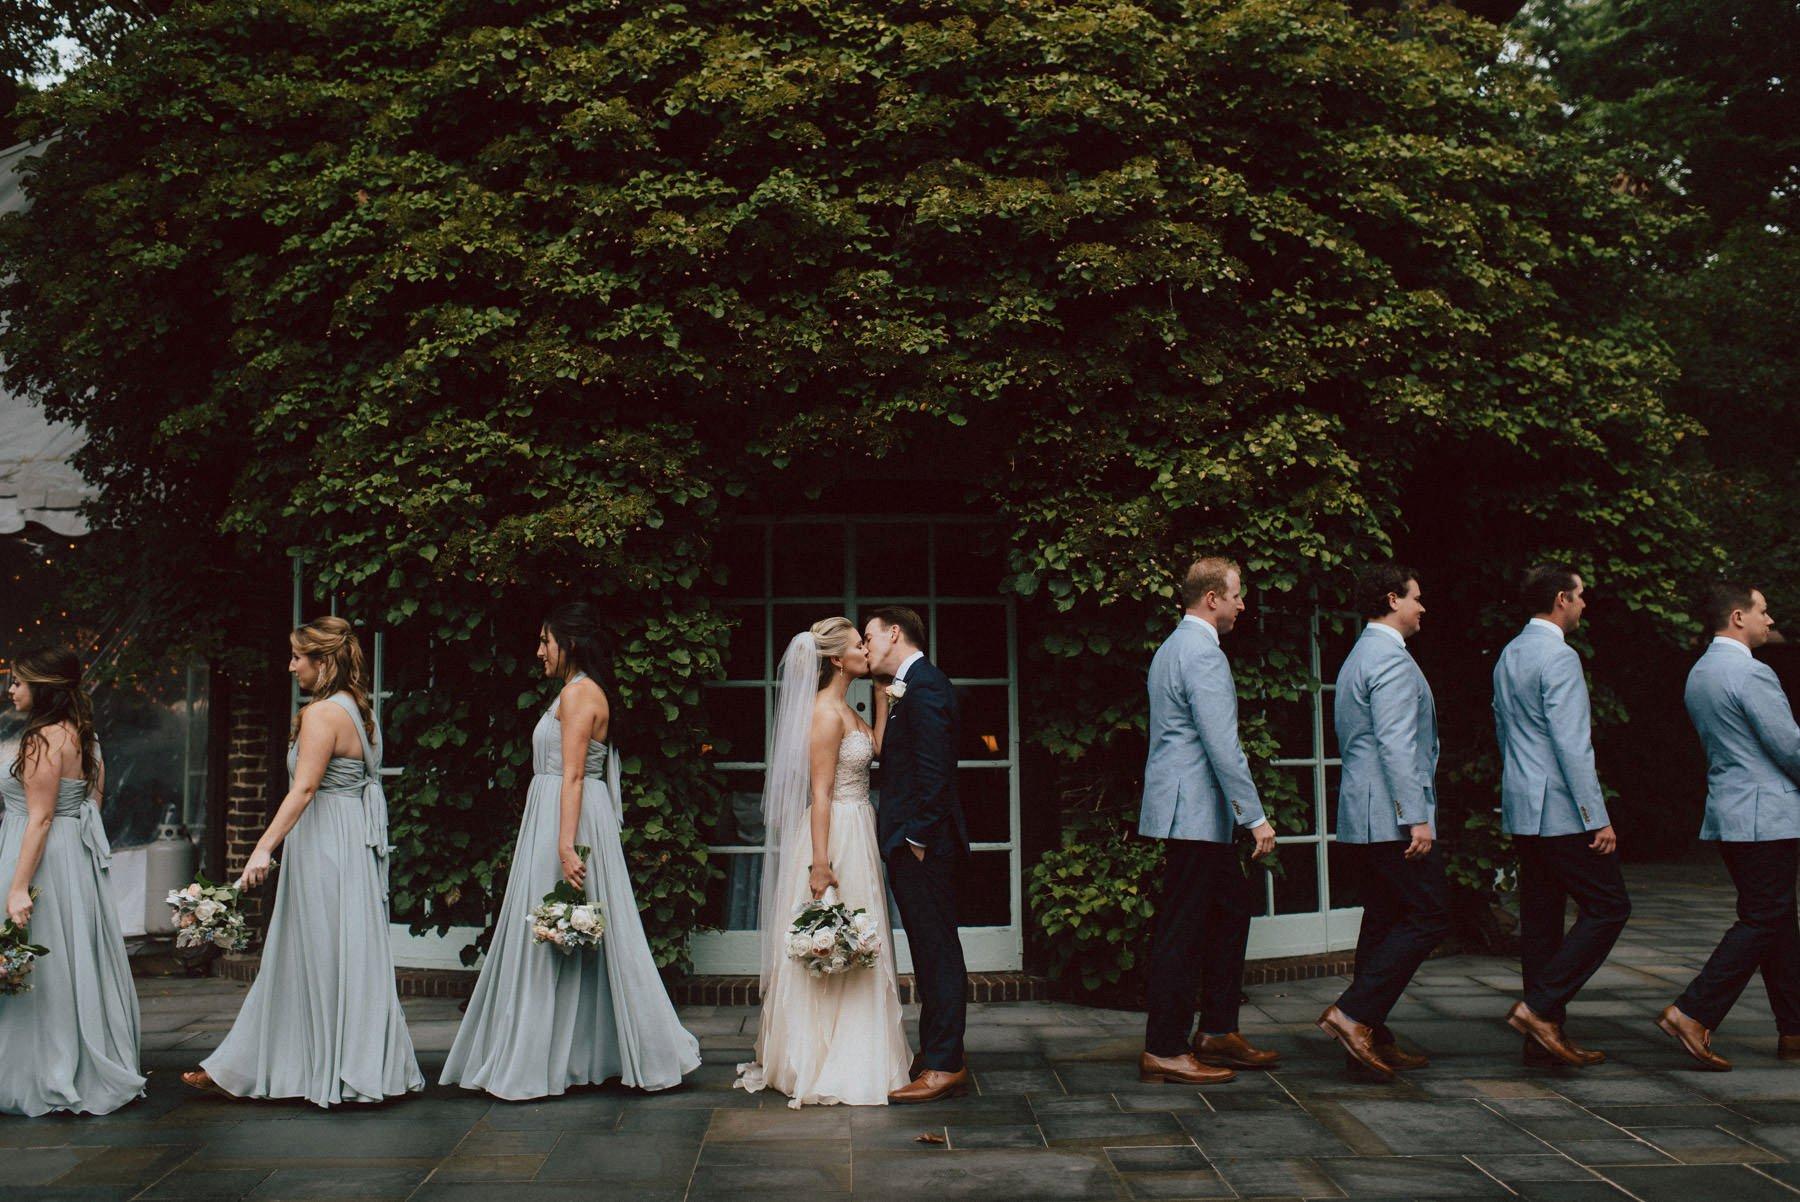 greenville-country-club-wedding-103.jpg